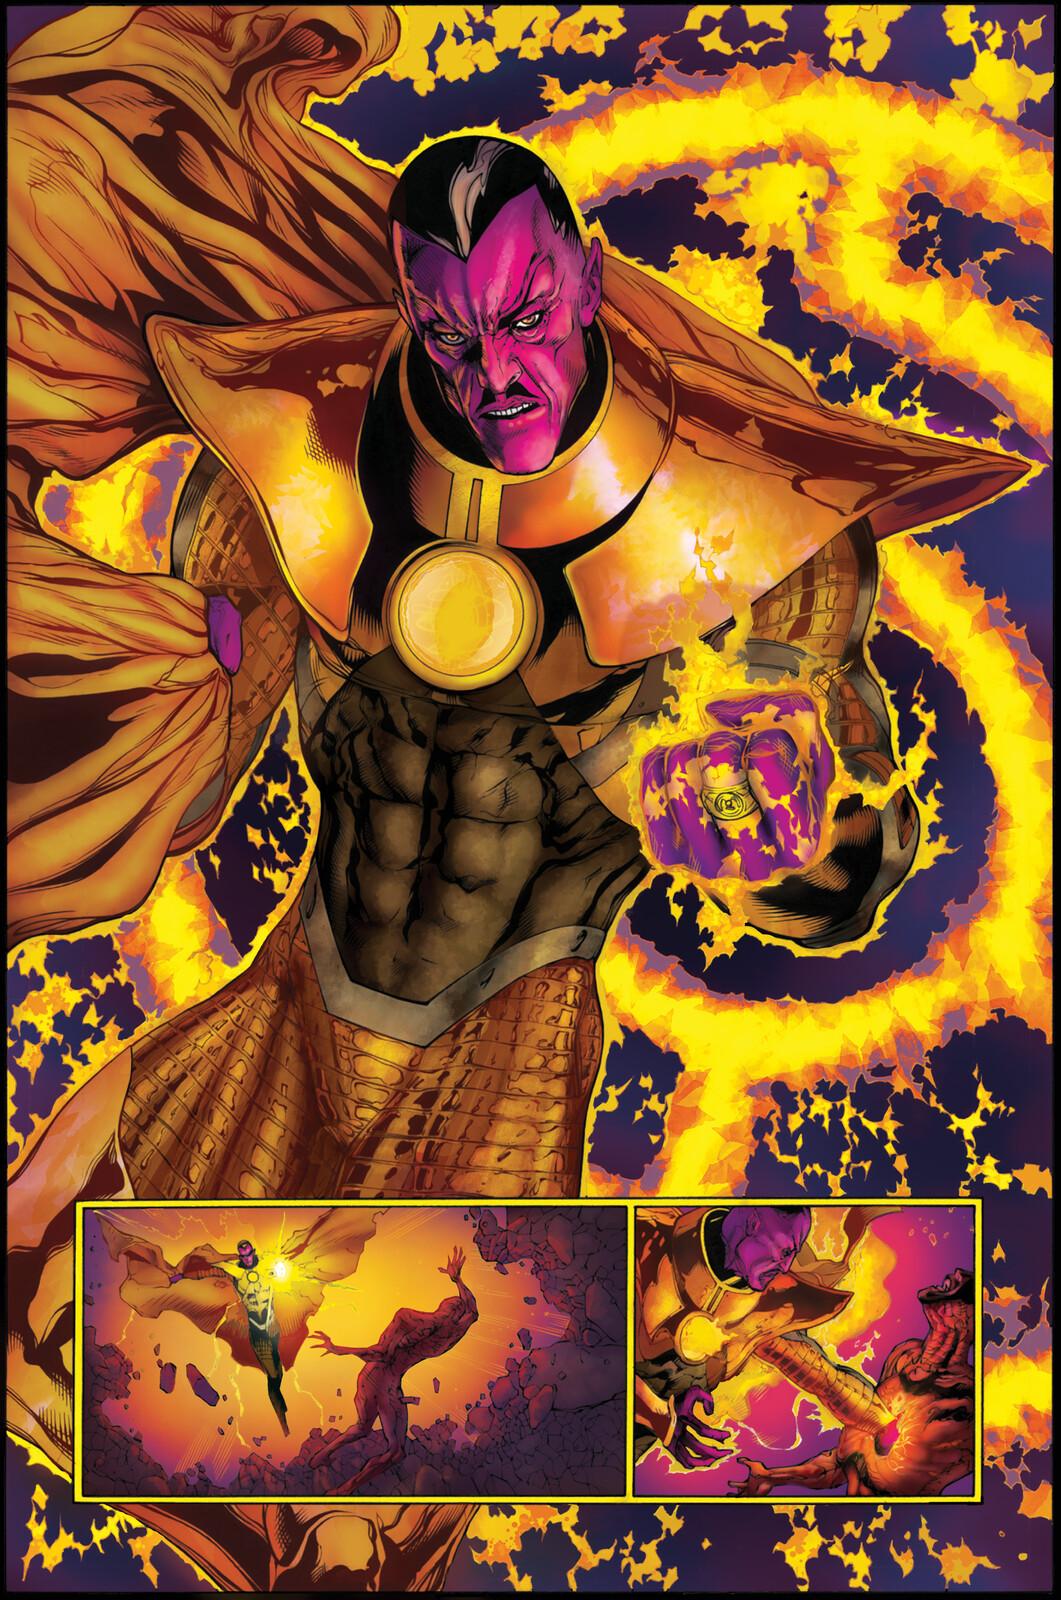 Sinestro / Parallax - Colors